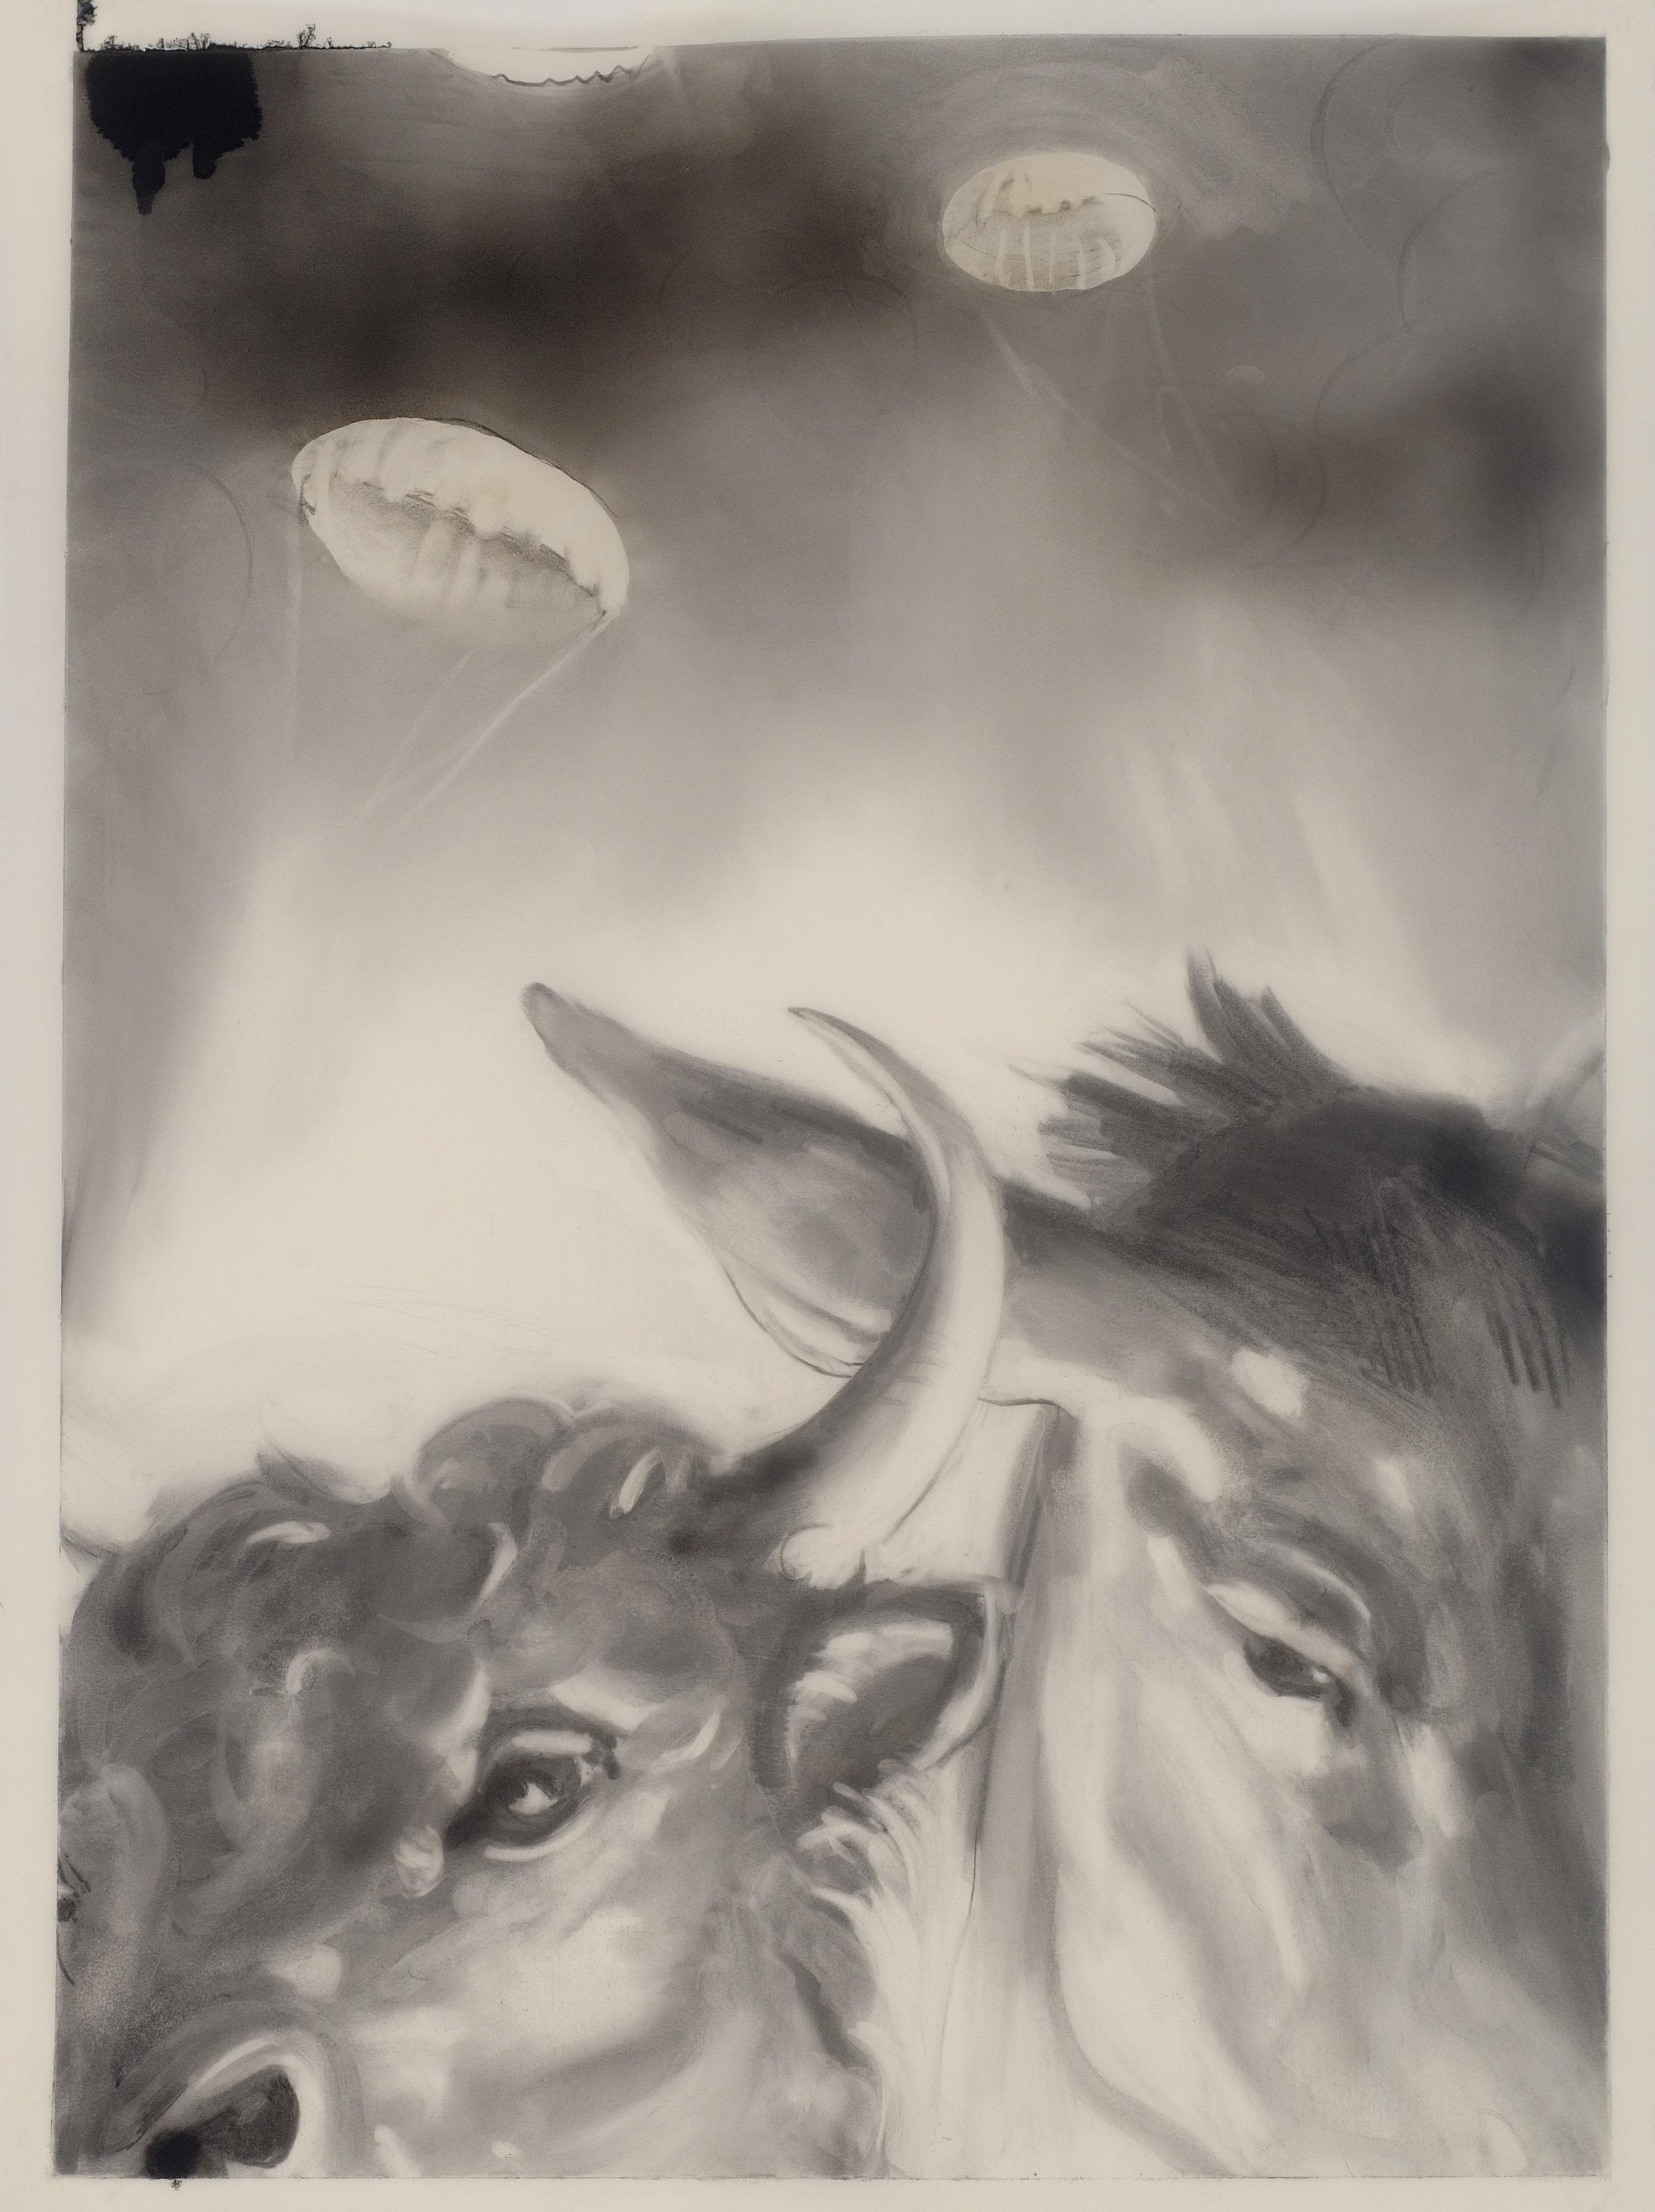 bull and donkey, 2012, graphite, charcoal, acrylic airbrush on vellum, 38%22x25%22.jpg